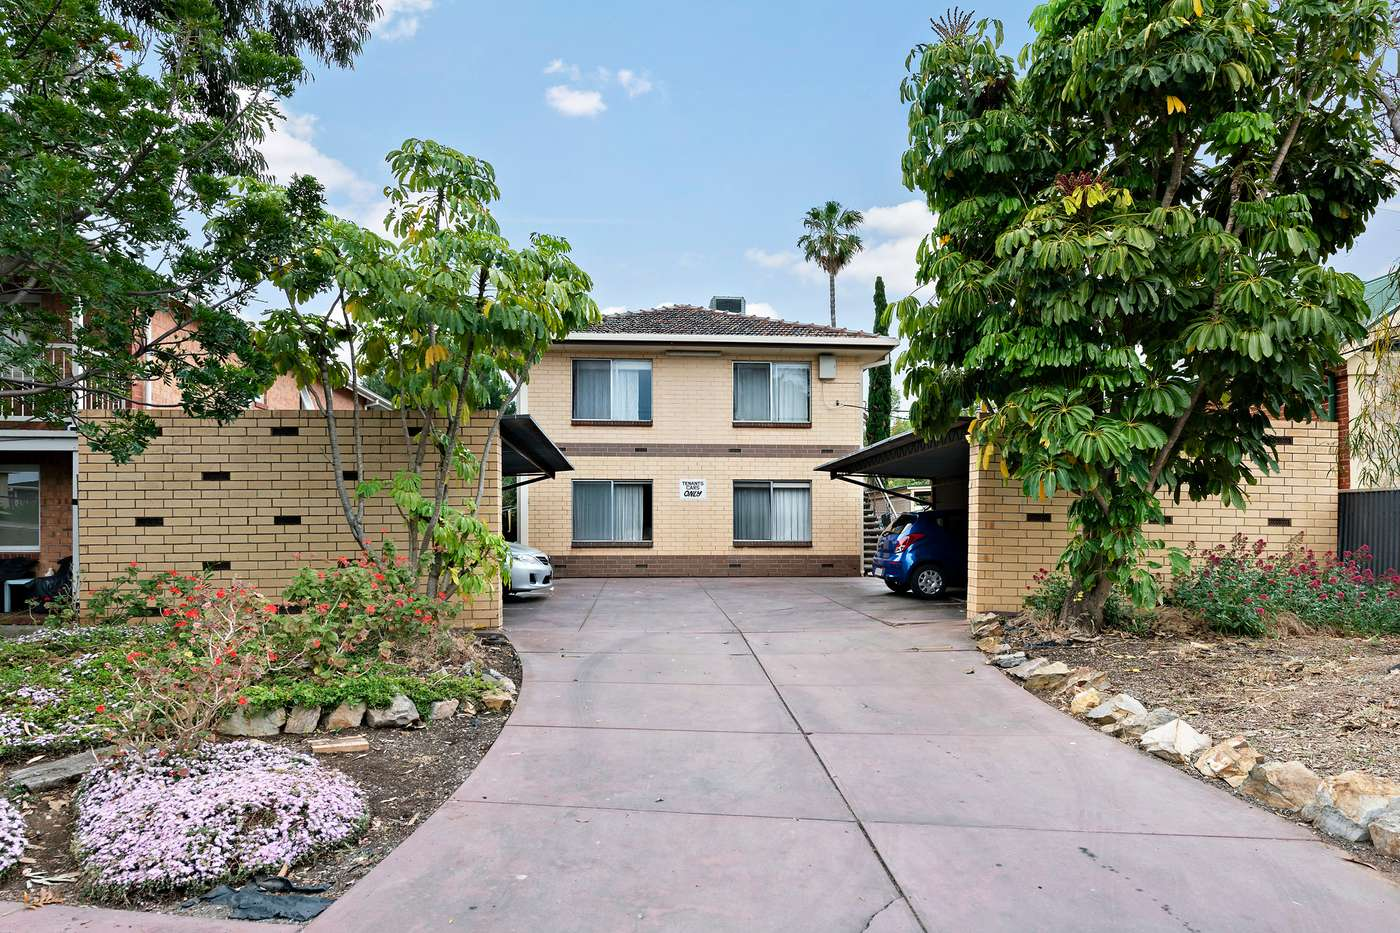 Main view of Homely unit listing, 4/4 Henry Street, Plympton, SA 5038